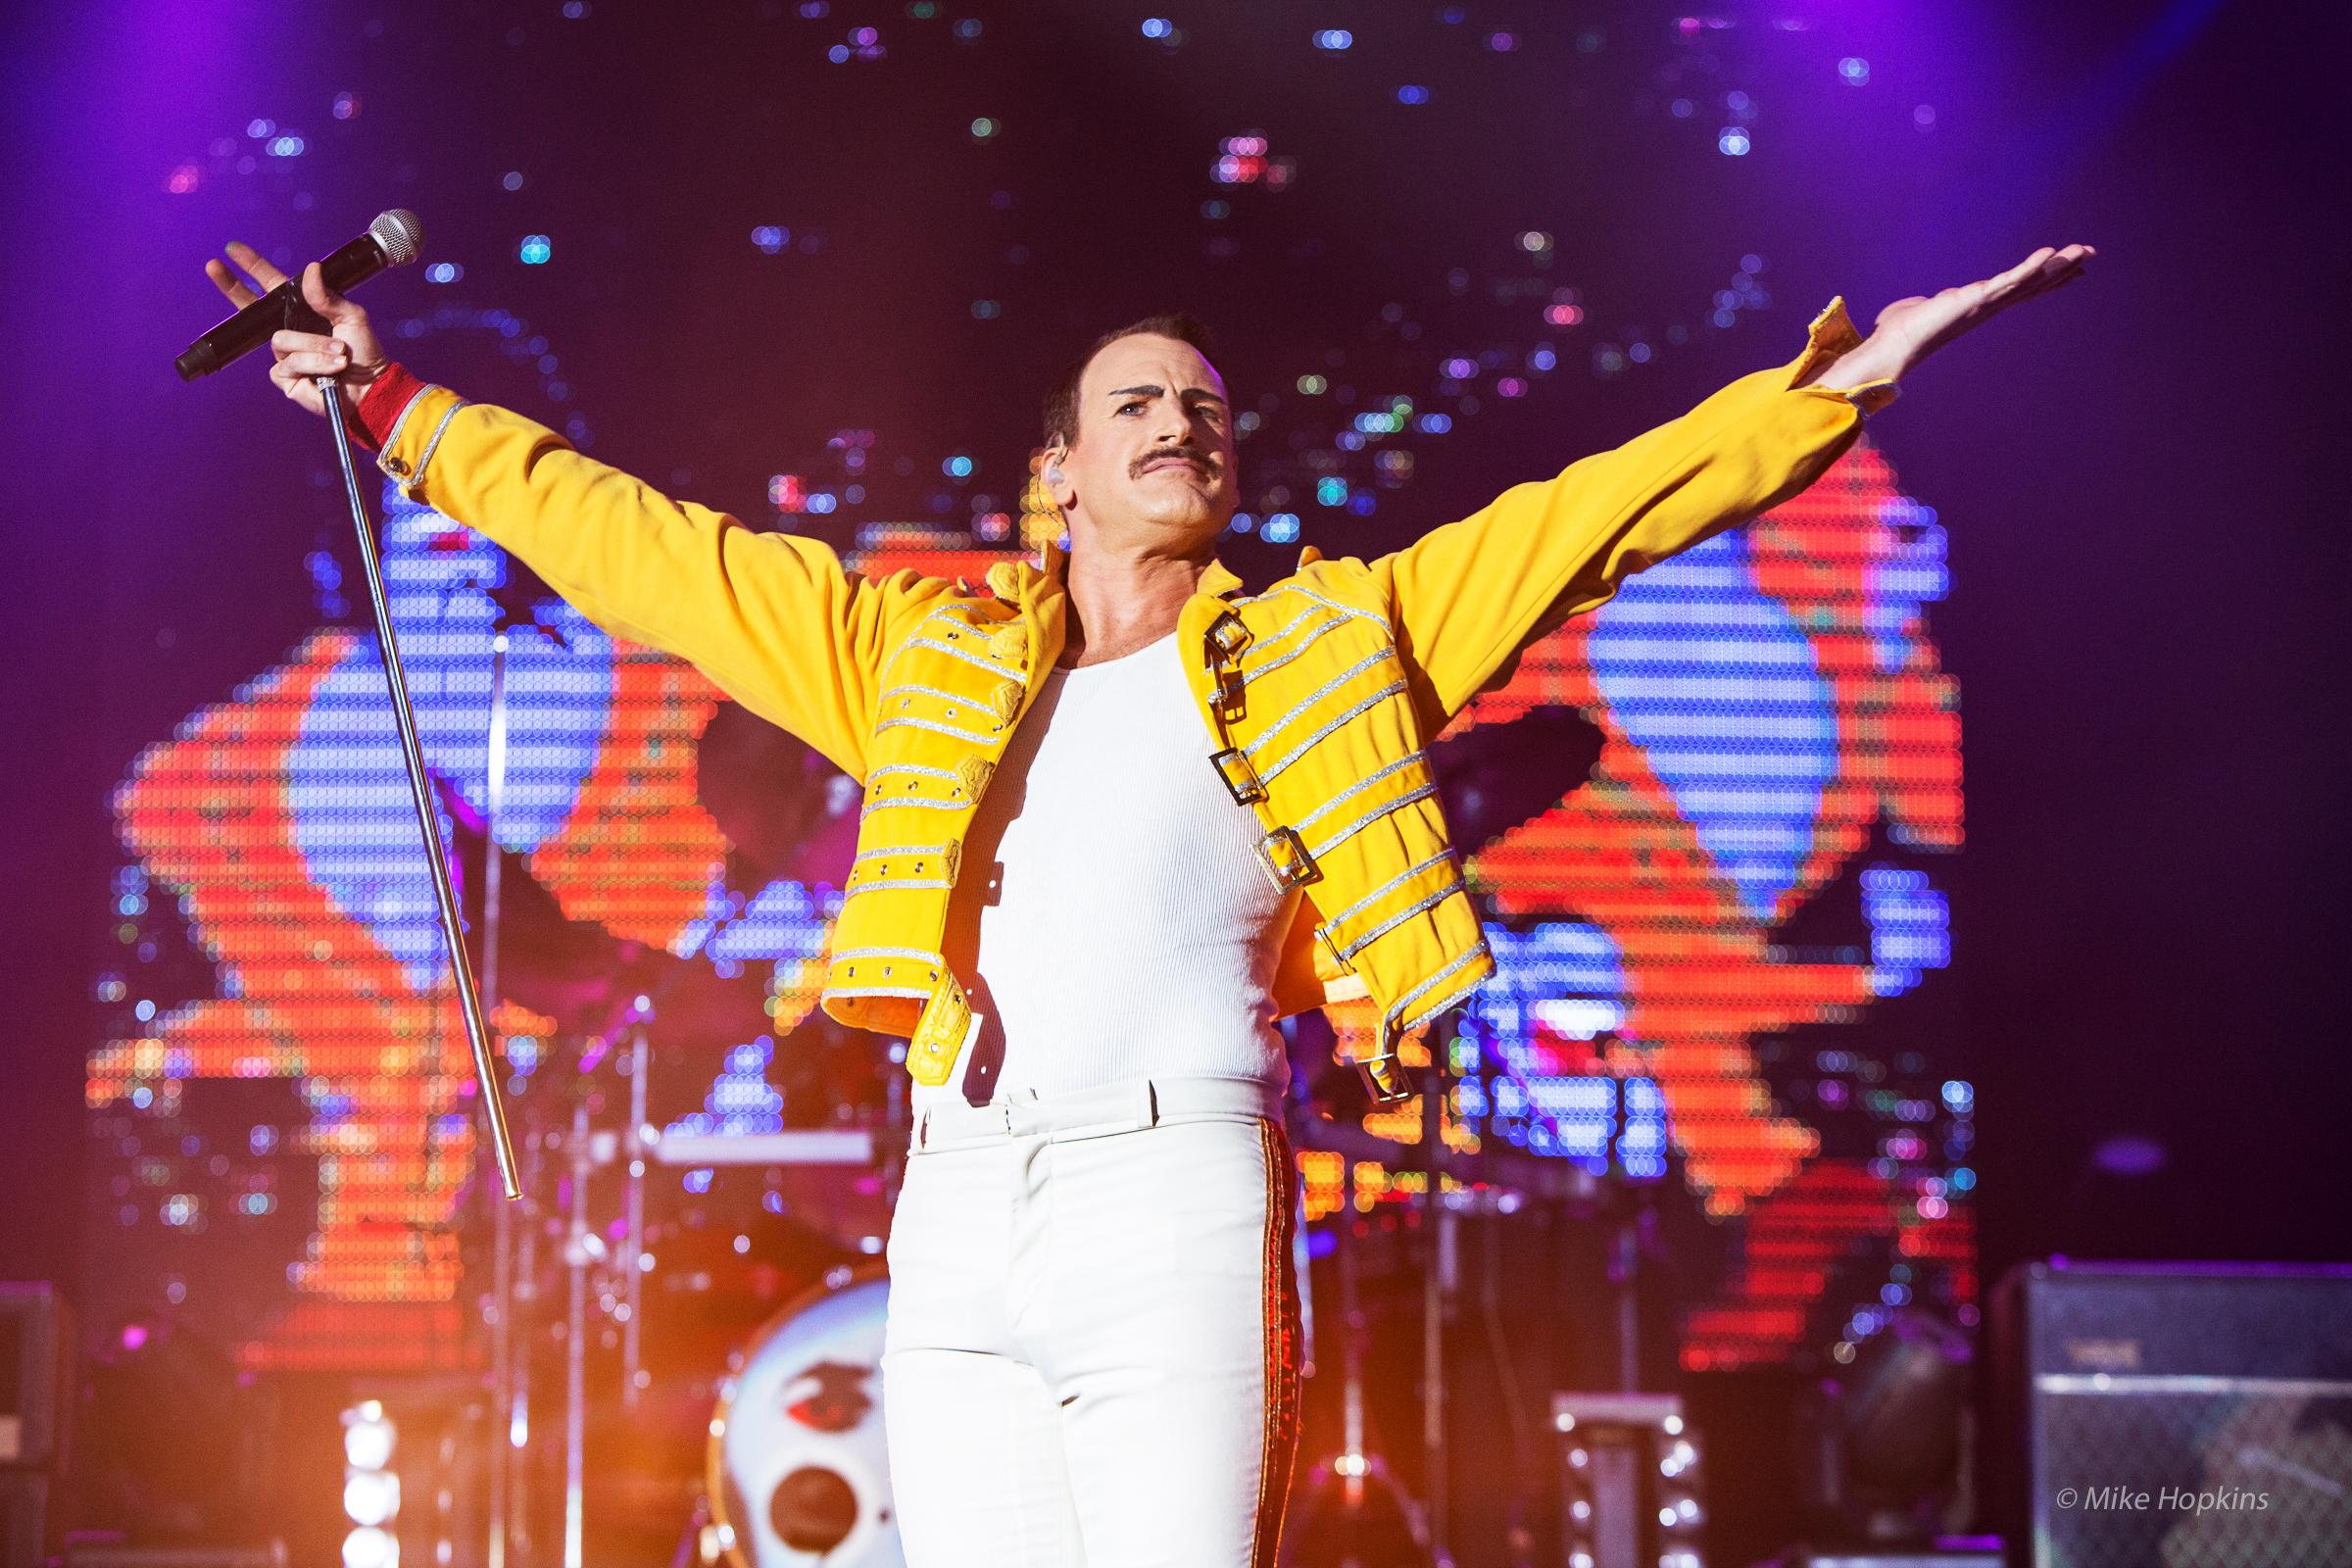 Queen Tribute Show - PeanutGallery247